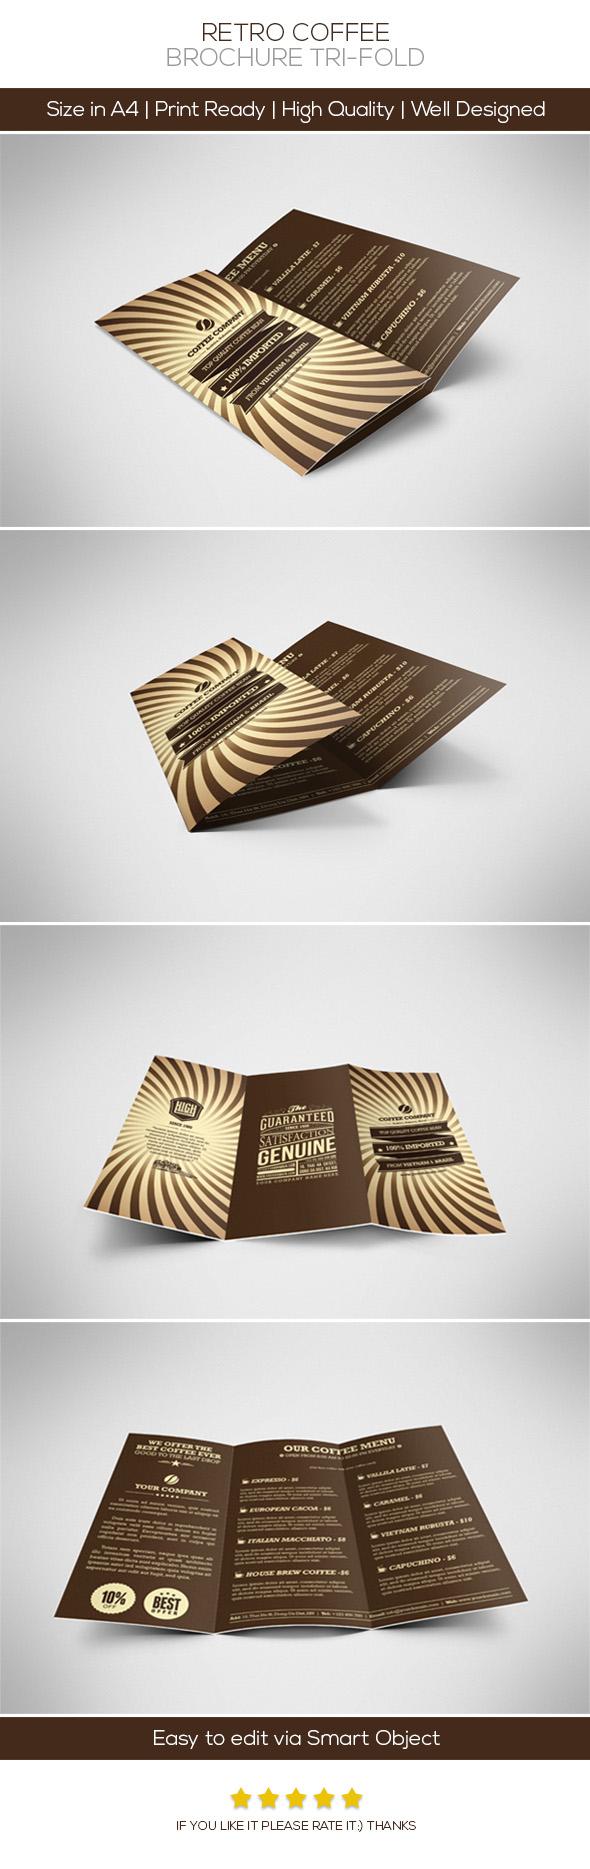 Retro Coffee Brochure